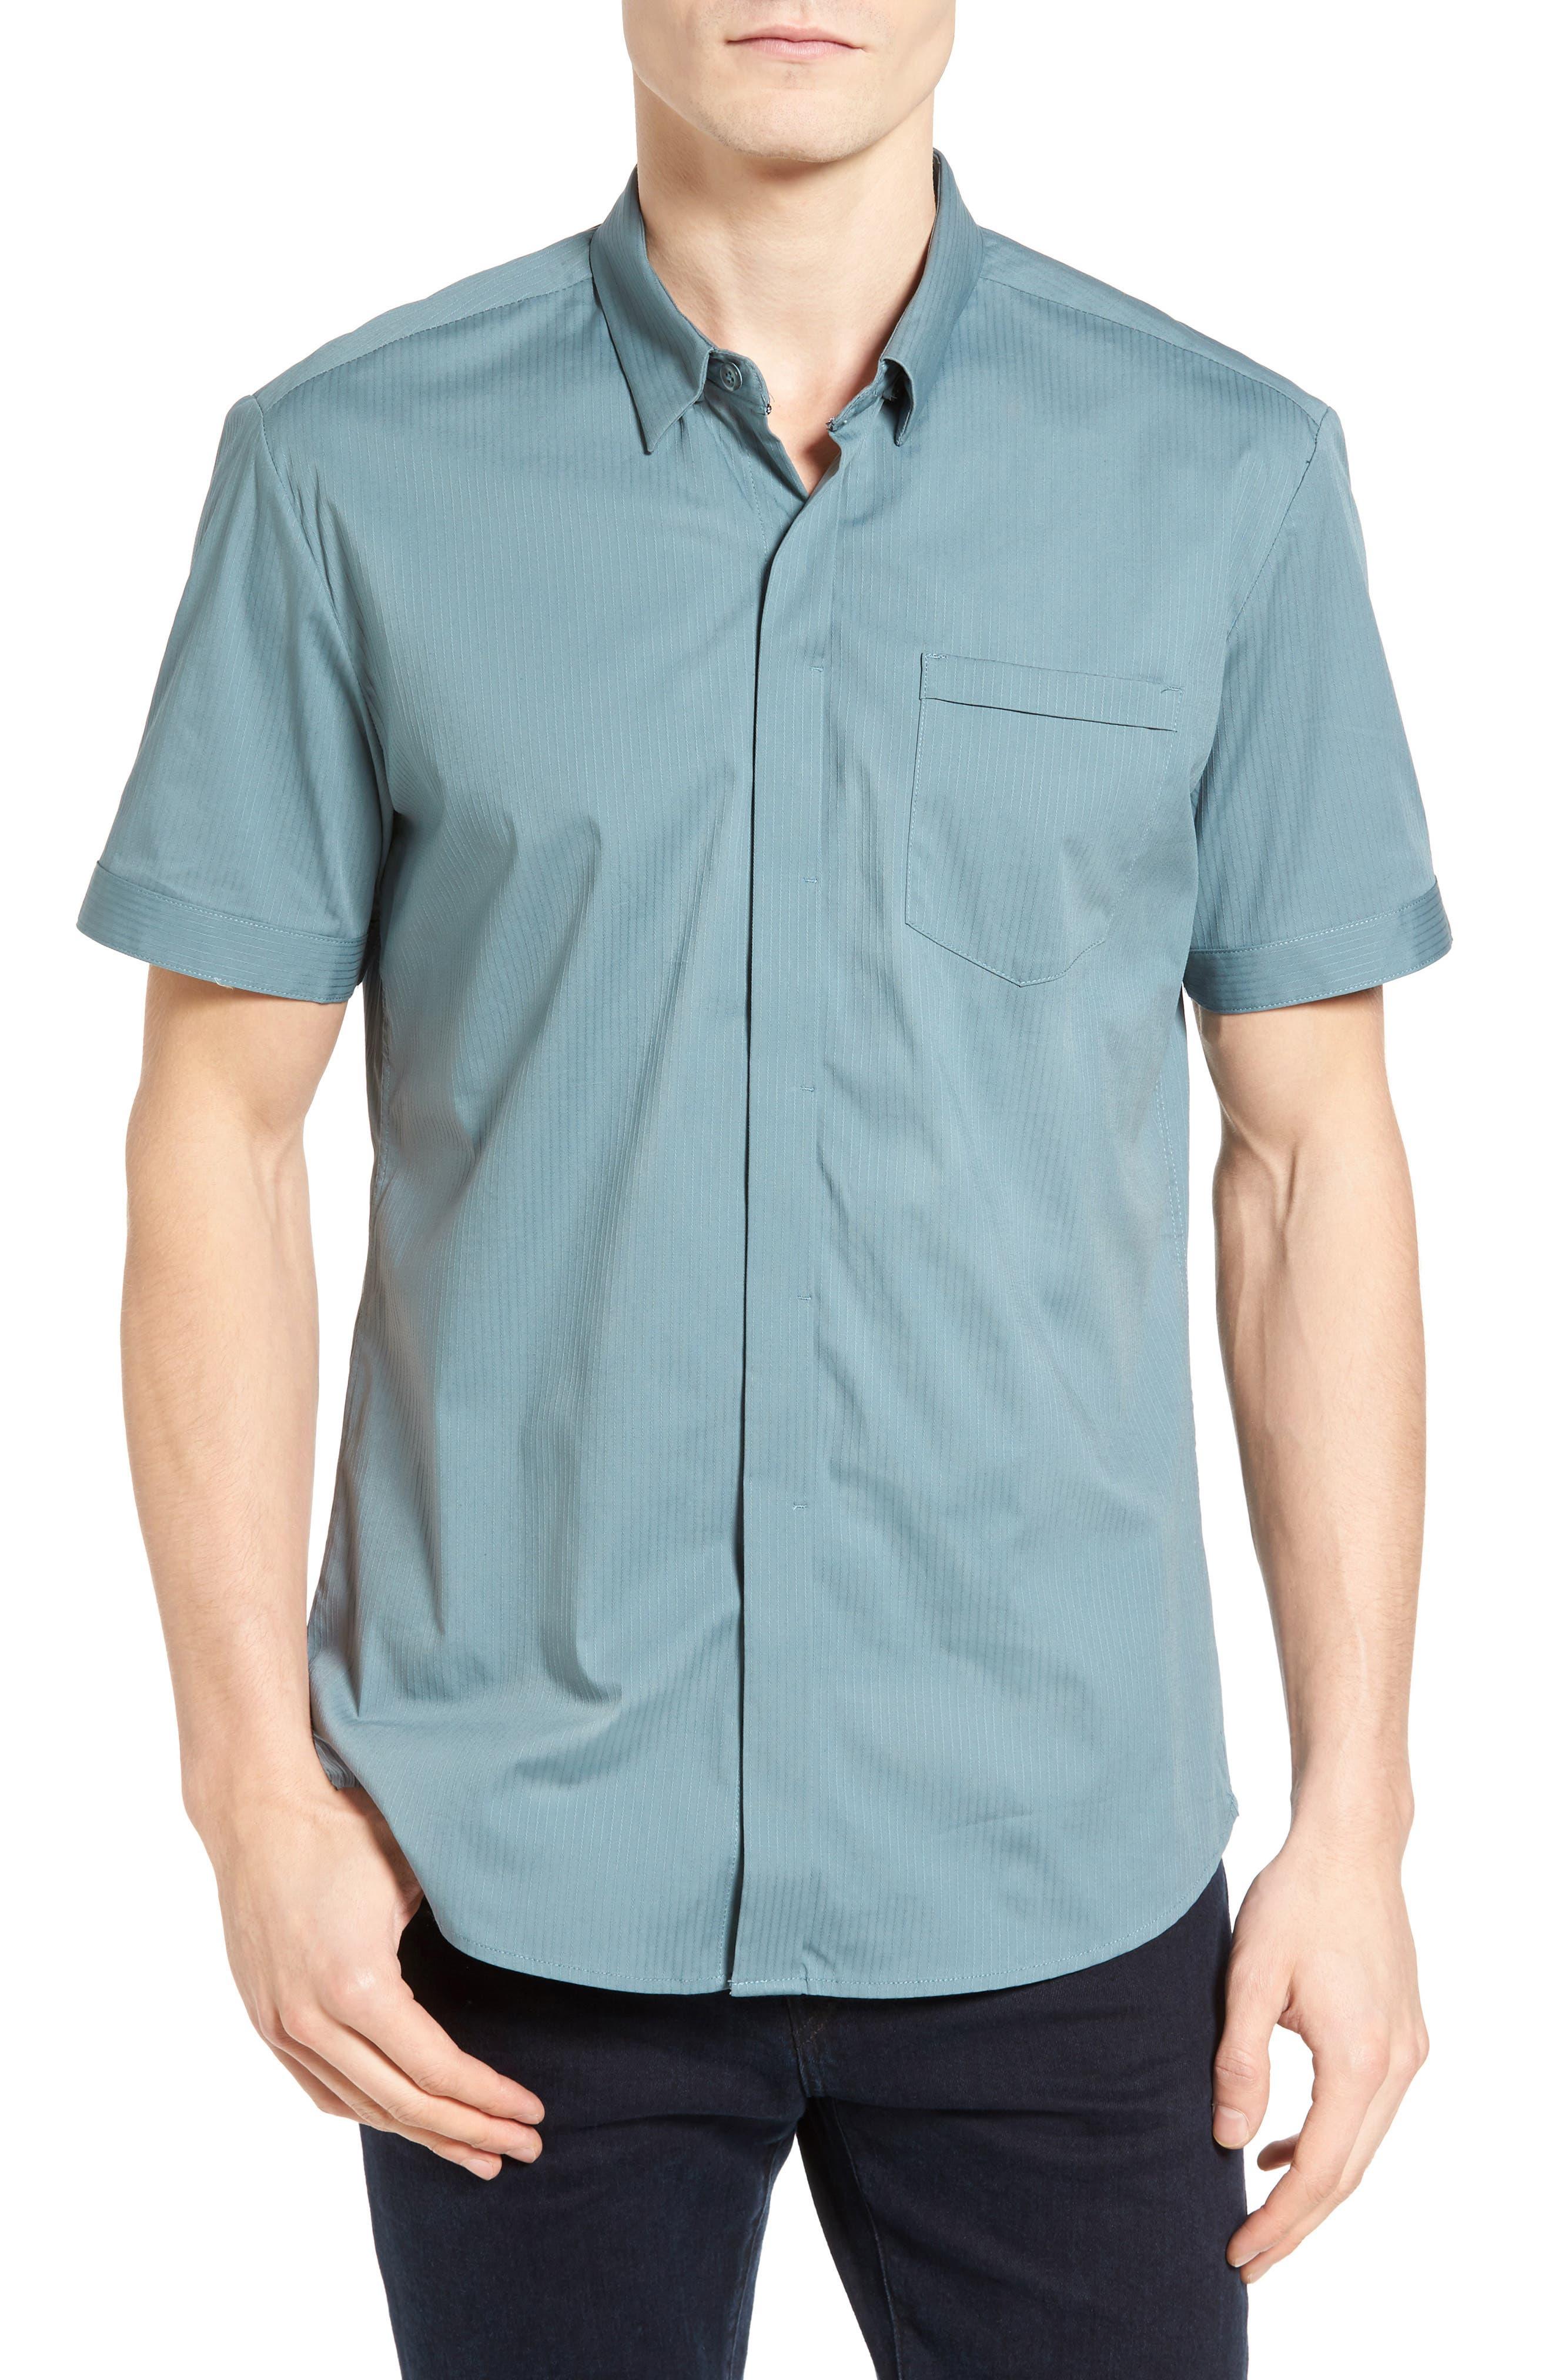 Alternate Image 1 Selected - 7 Diamonds City Savior Woven Shirt